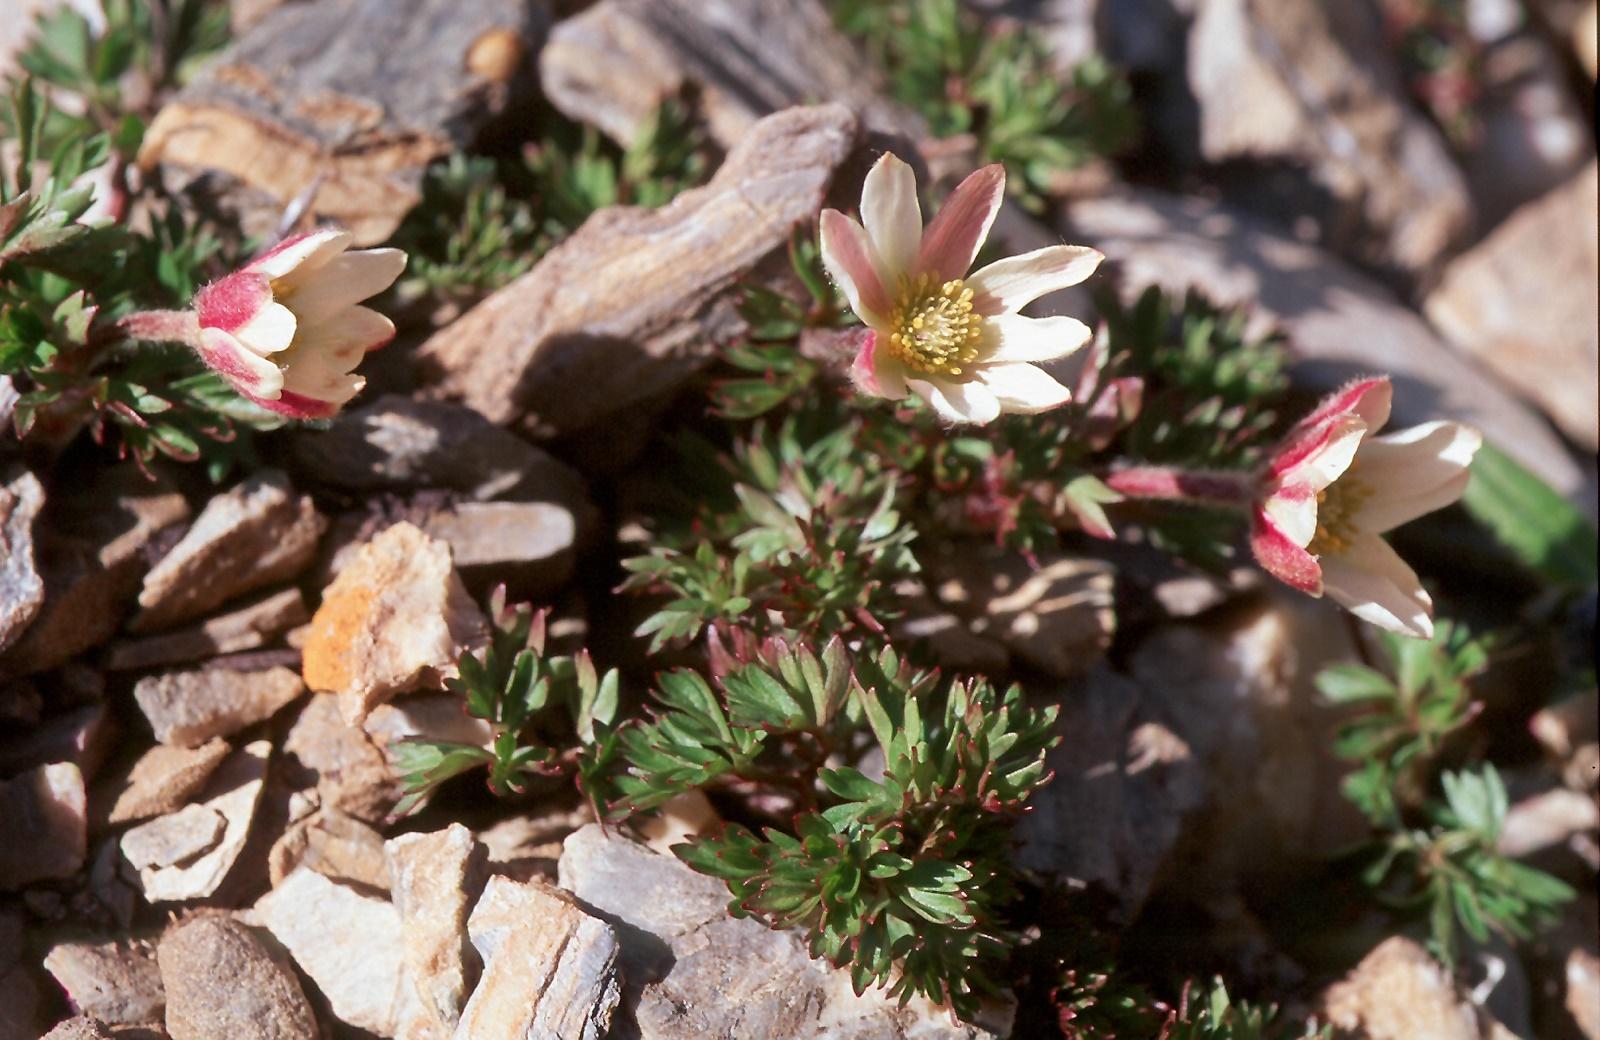 Anemone baldensis